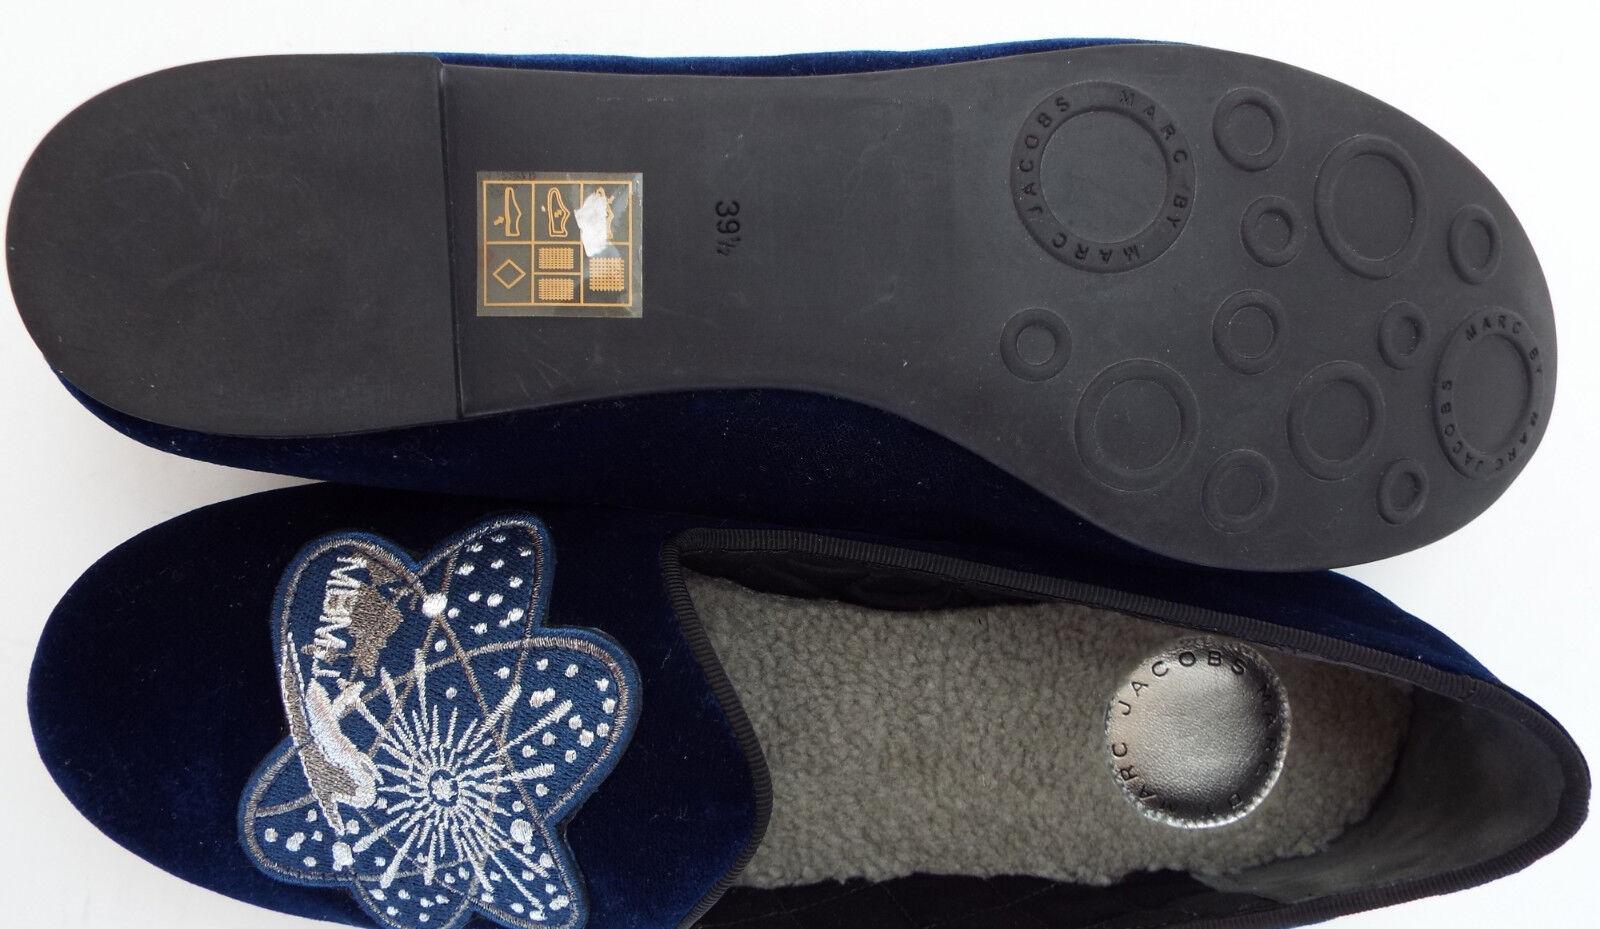 New MARC MARC MARC JACOBS Size 9 bluee Velvet Space Shuttle Slipper Flats shoes 39 1 2 54ca94